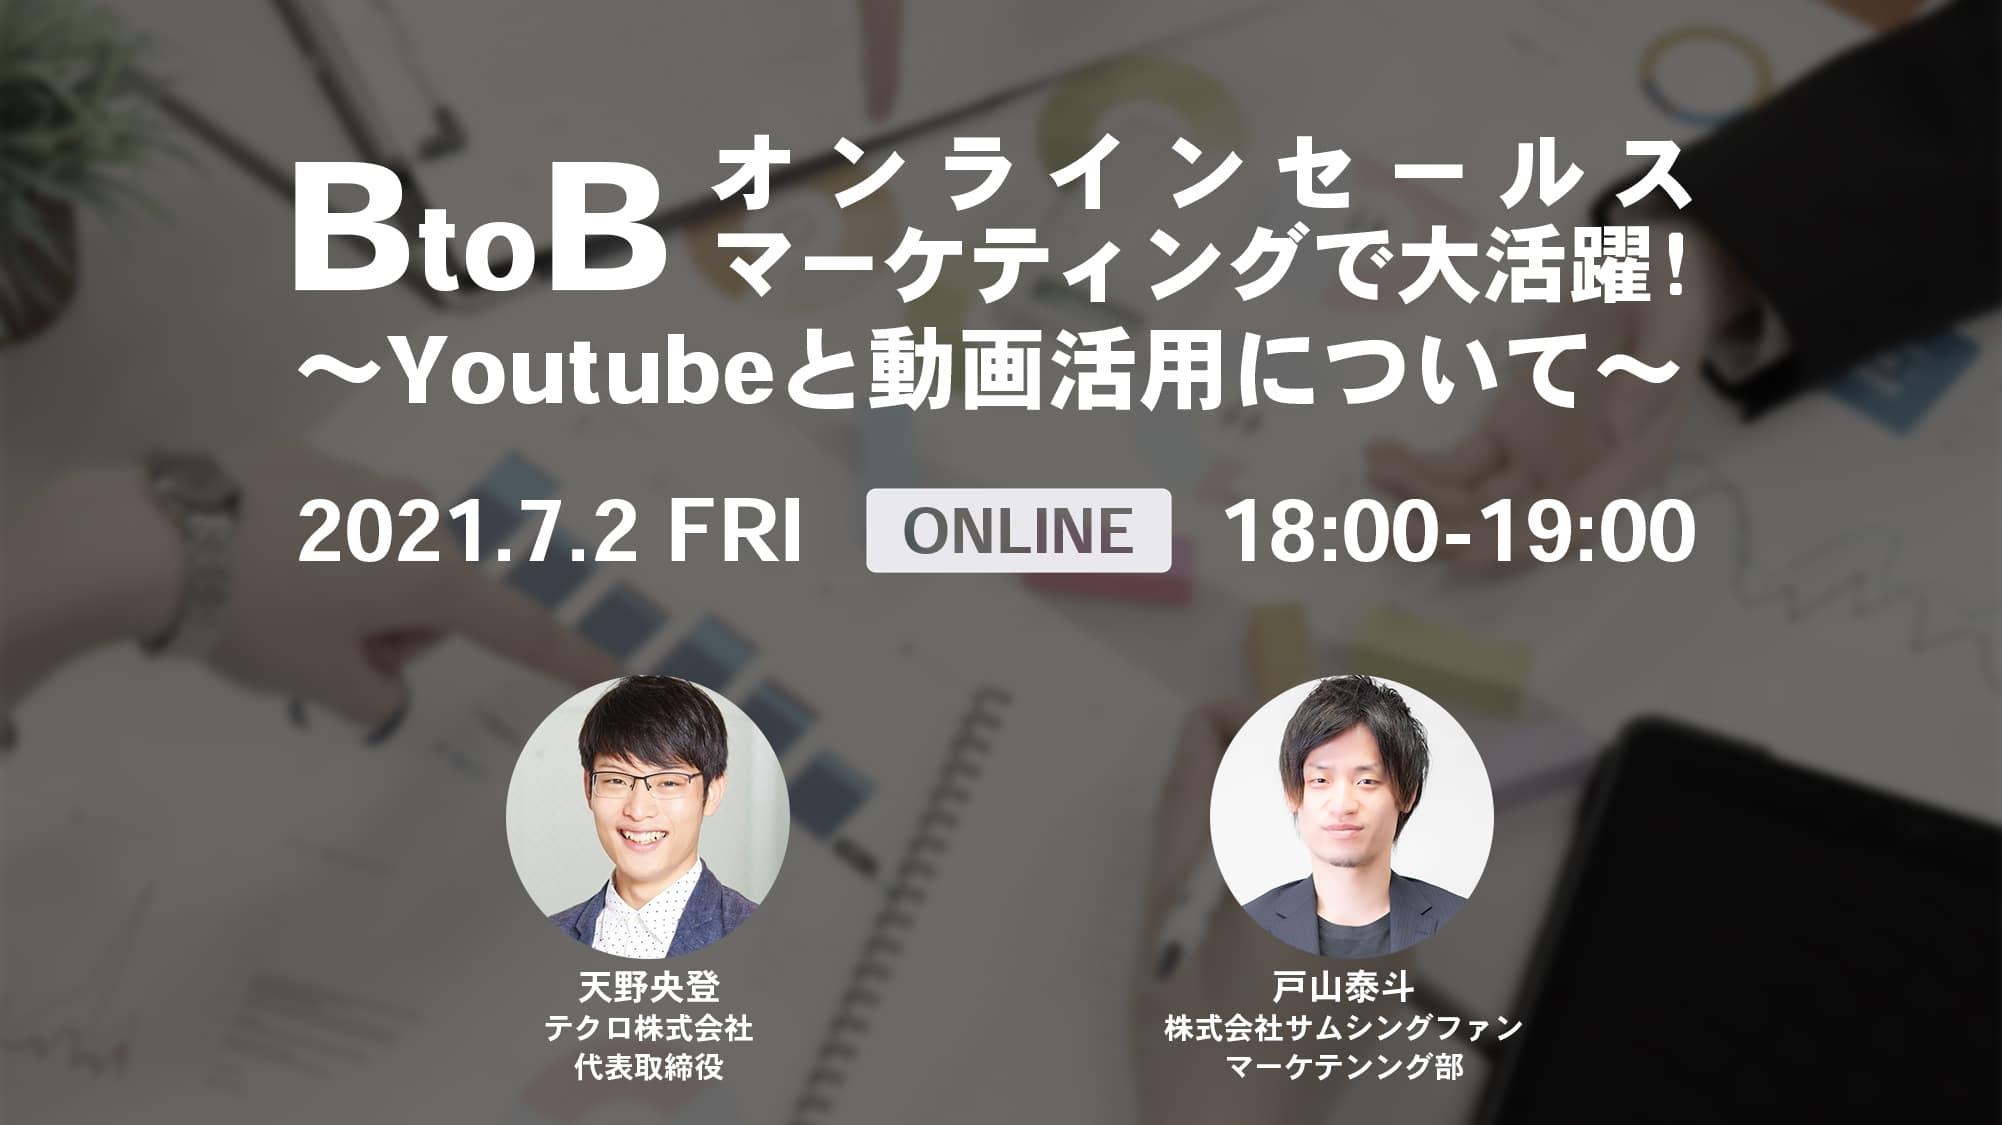 [7/2]BtoBオンラインセールス・マーケティングで大活躍!〜Youtubeと動画活用について〜